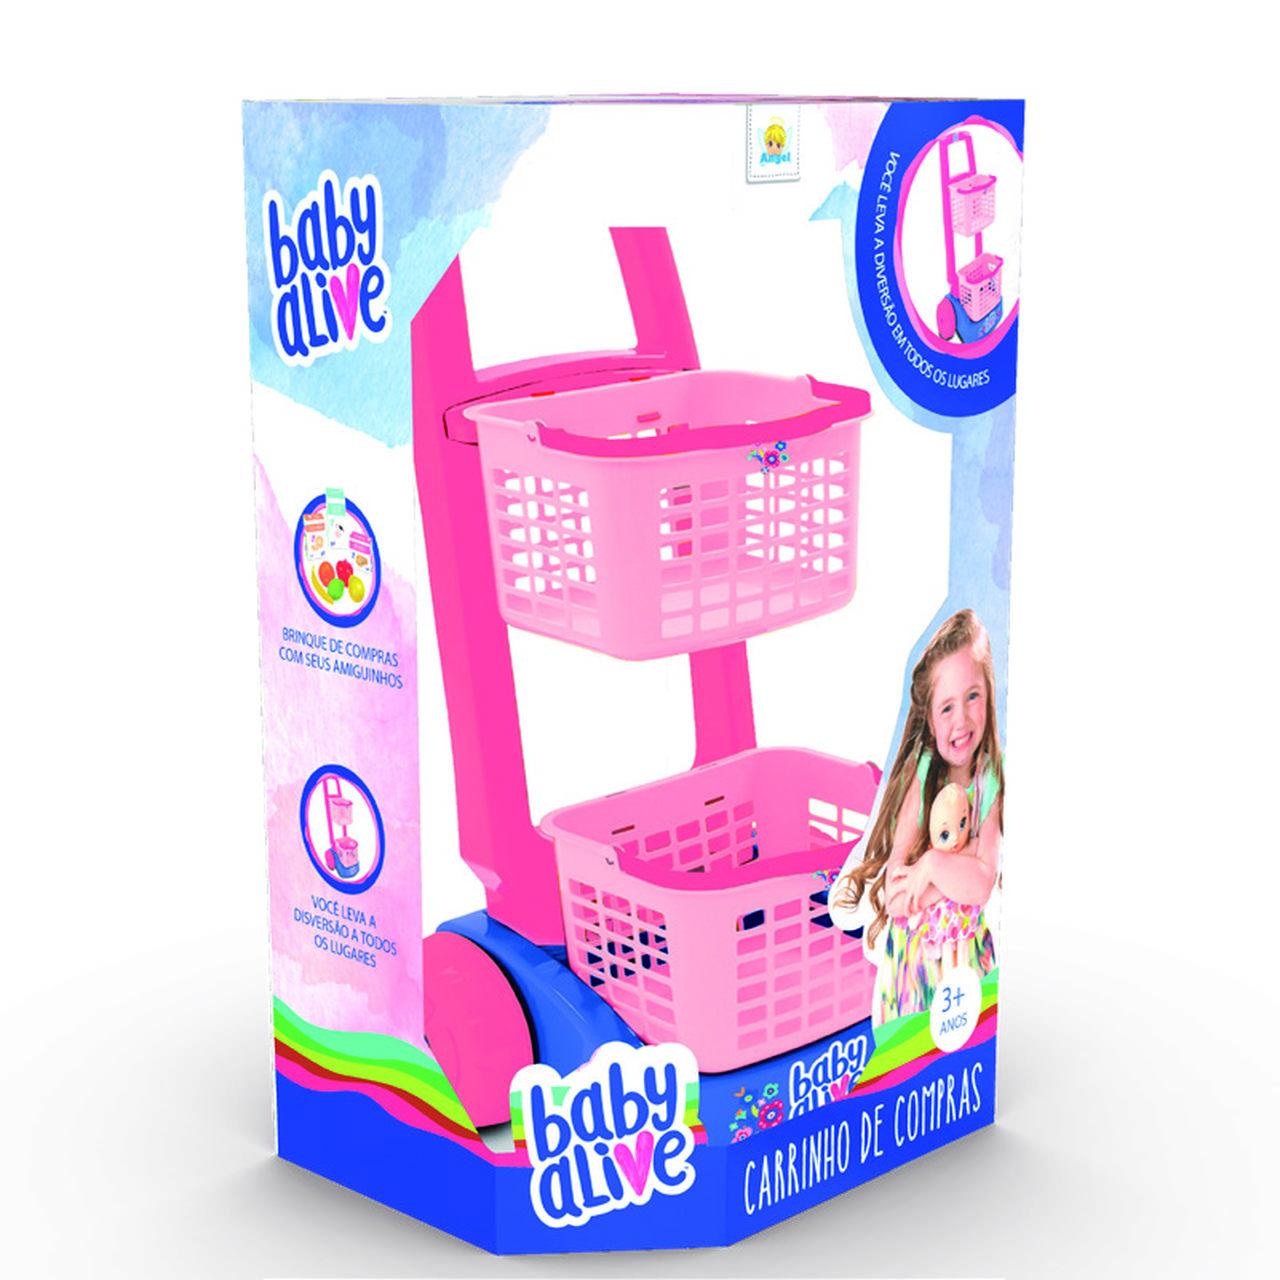 Carrinho de Compras Infantil Baby Alive - Angel Toys